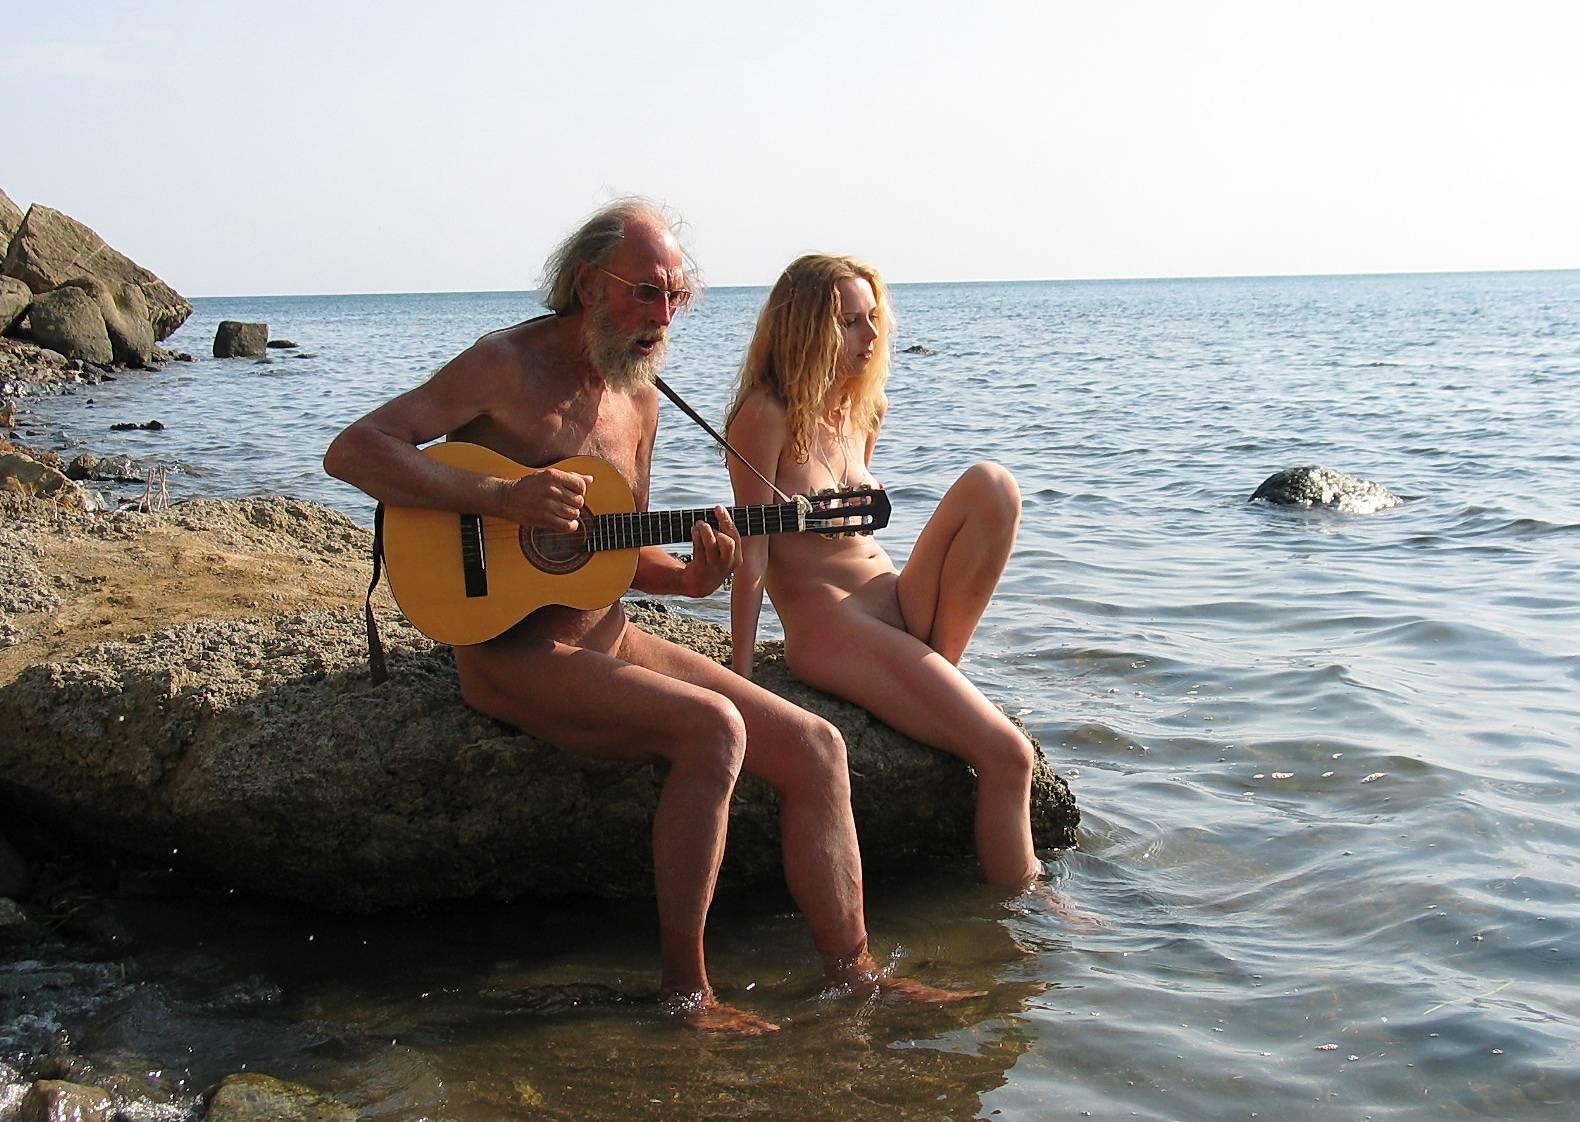 Nudist Photos Guitarists Beach Tunes - 2